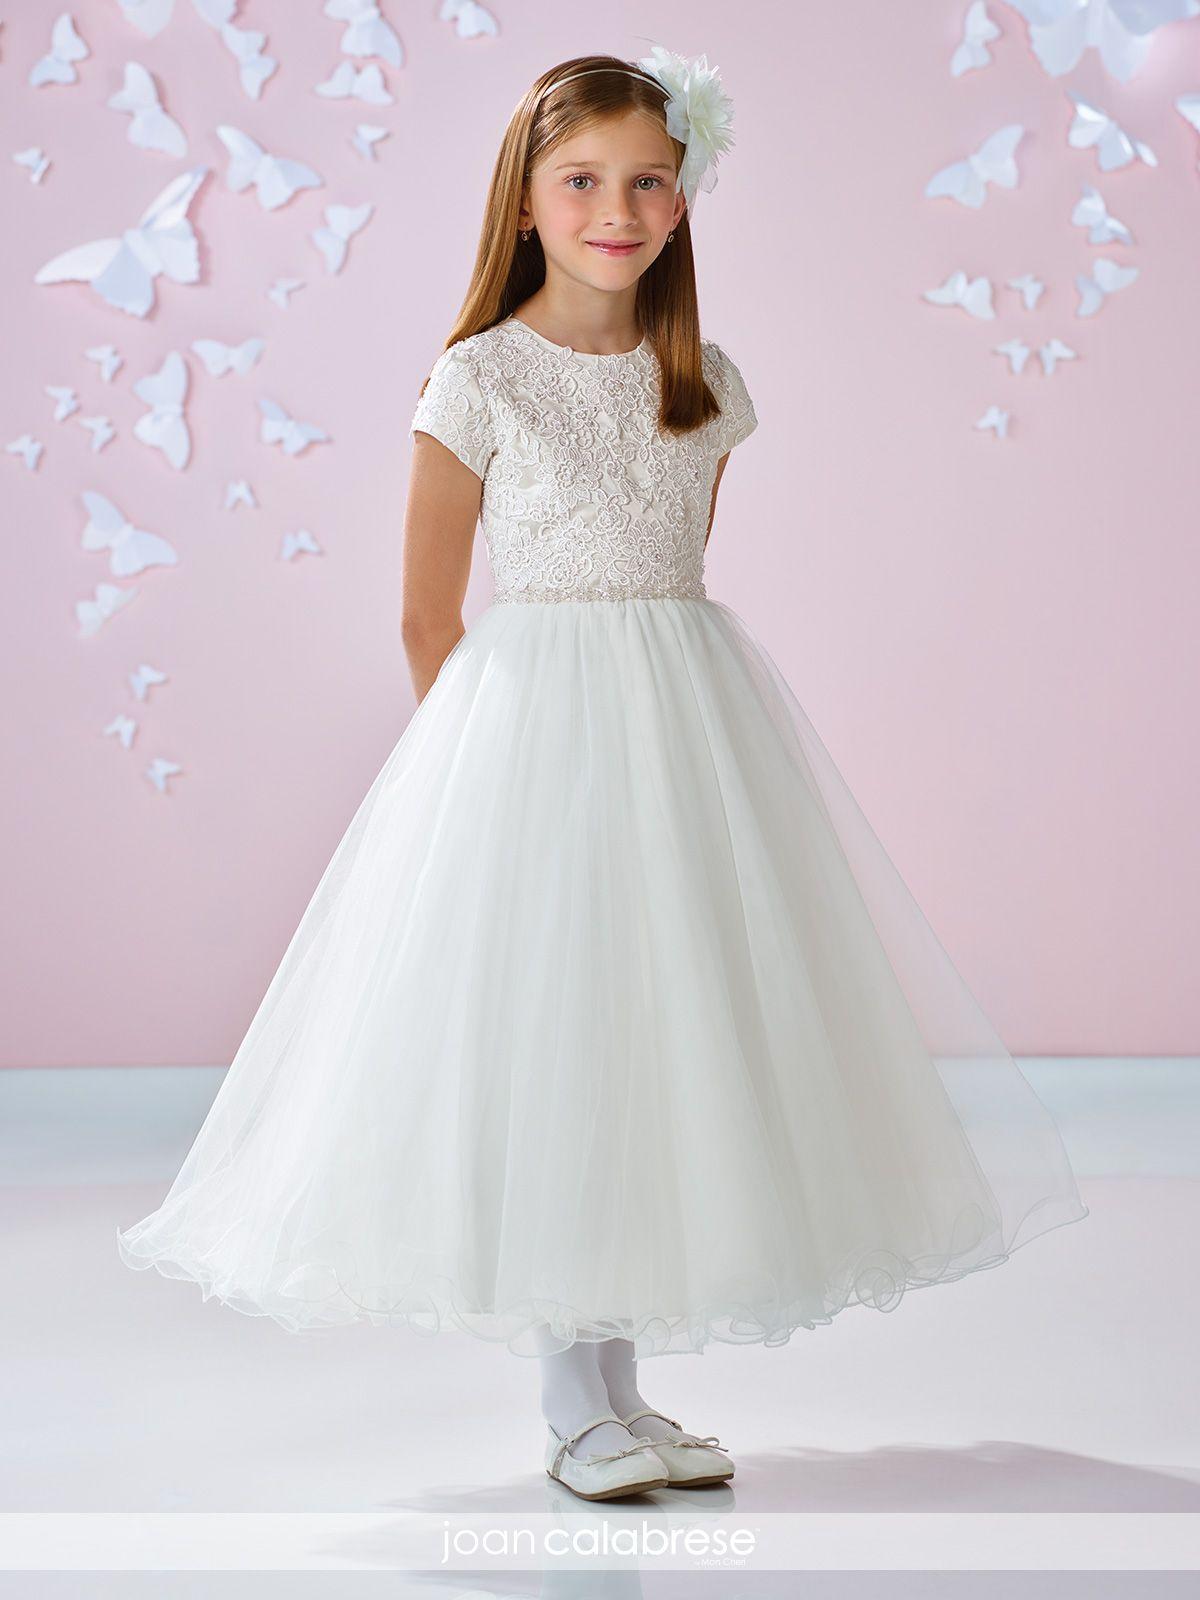 71a6903d537 Joan Calabrese Communion Dresses - Calabrese Girl - Mon Cheri little ...